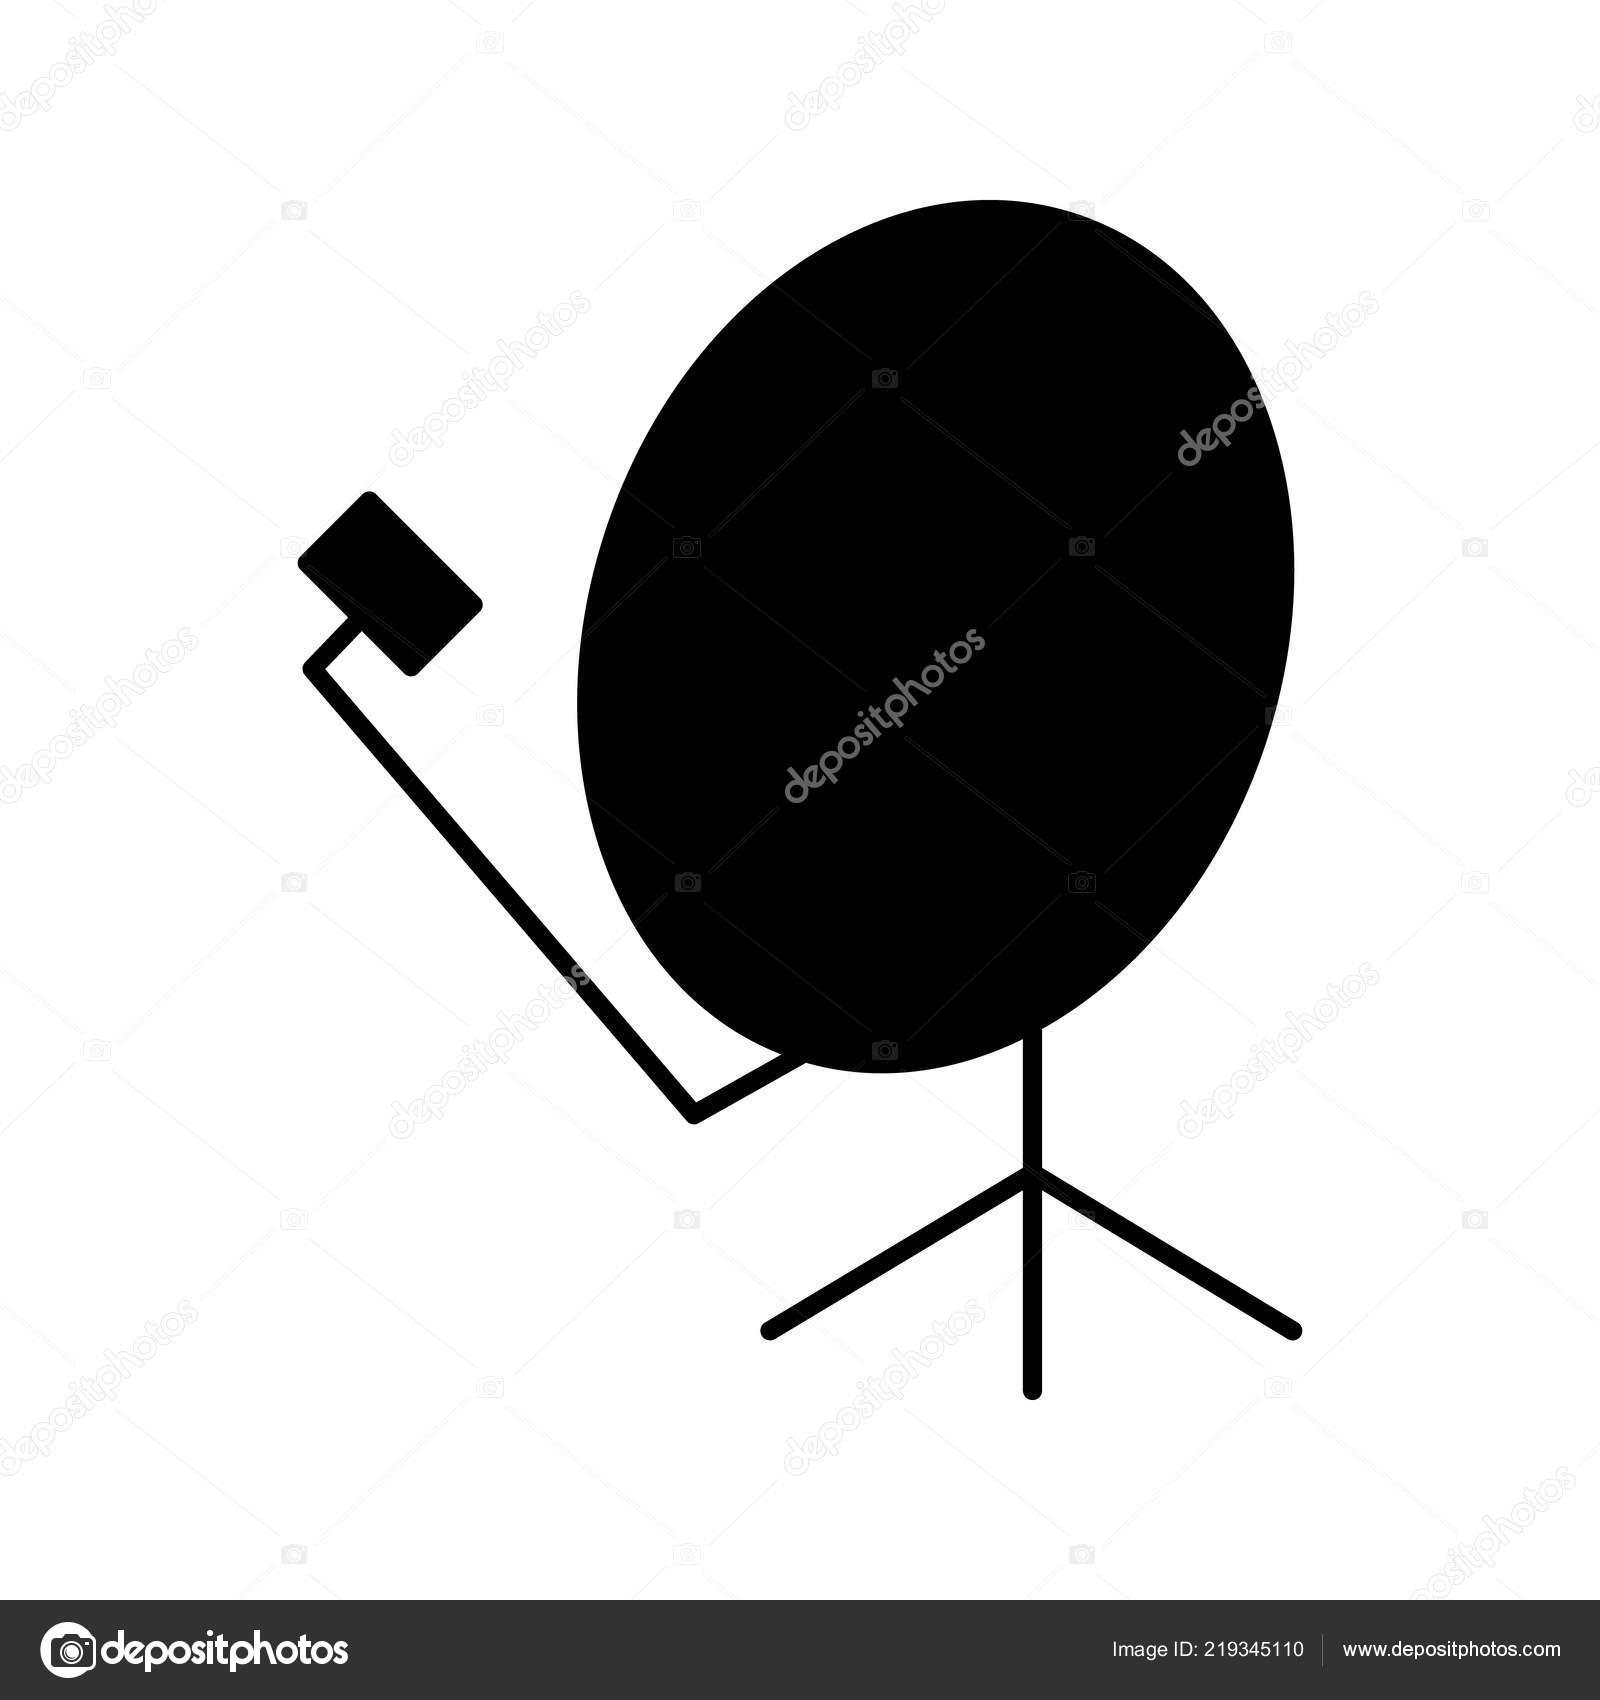 hight resolution of satellite dish glyph icon silhouette symbol parabolic antenna negative space stock vector